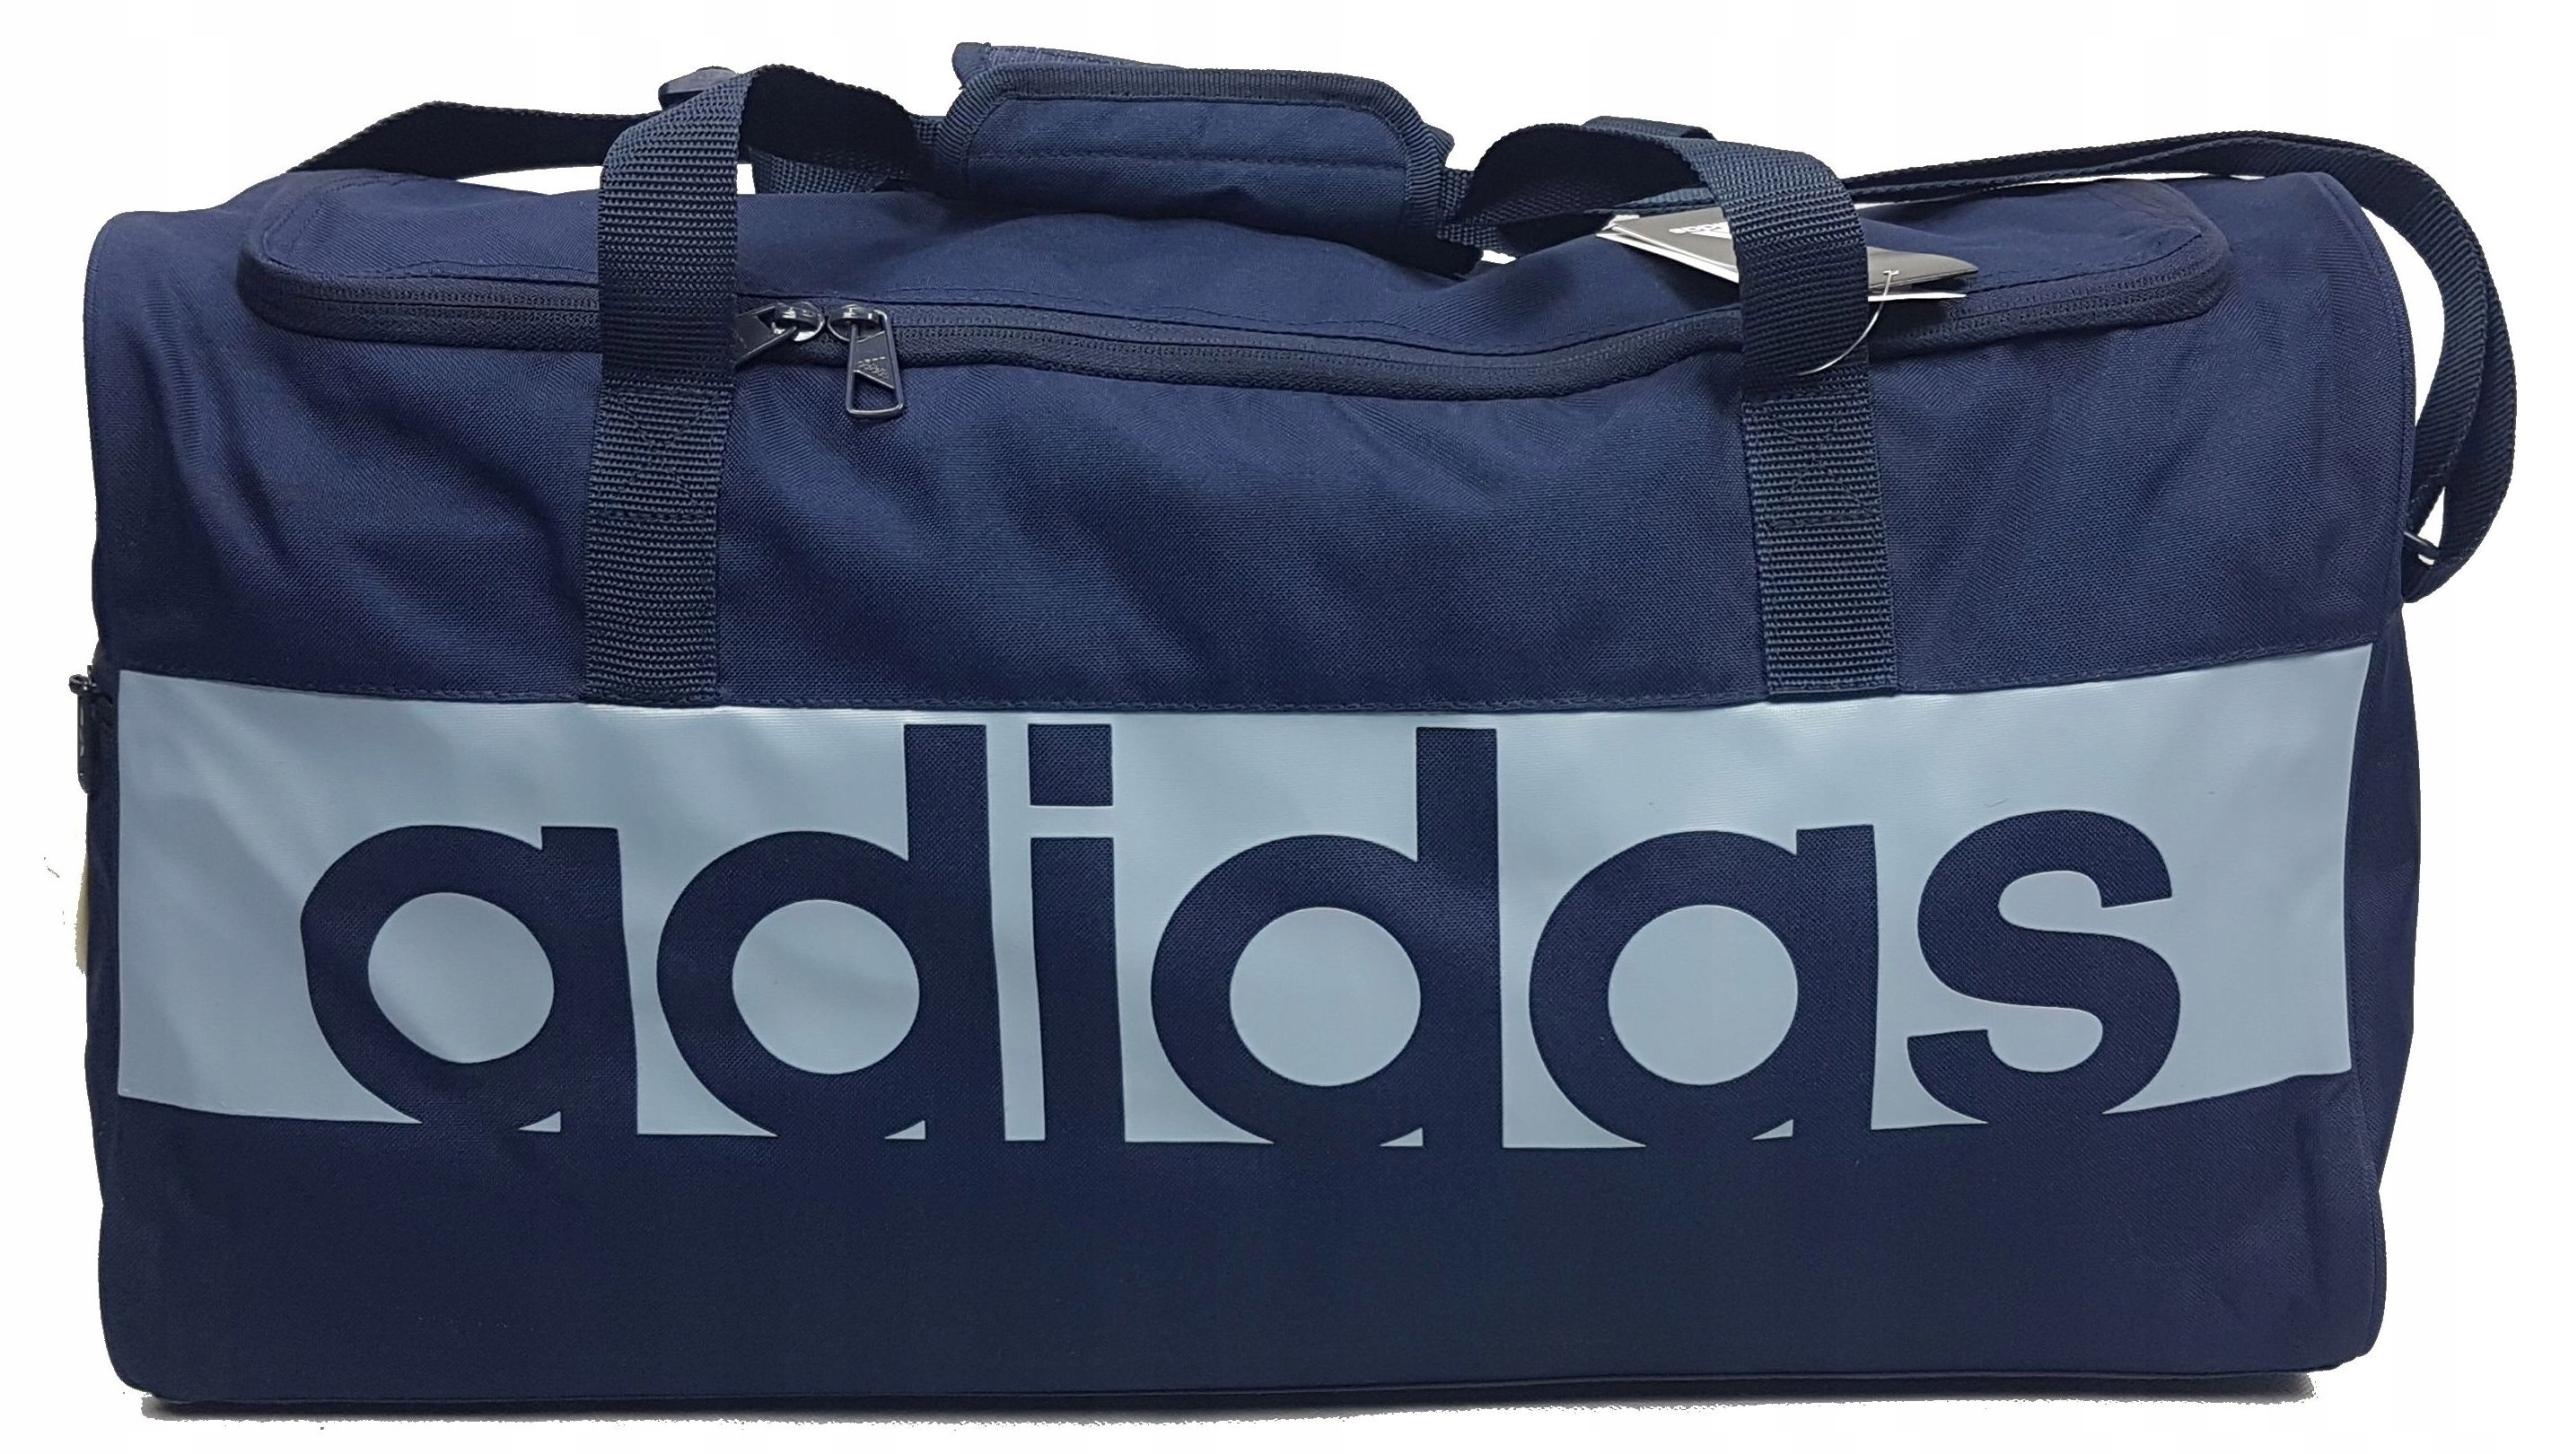 211ffd0ac16dc Adidas Torba Sportowa LINEAR PERFORMANCE S99960(M) 7828755966 - Allegro.pl